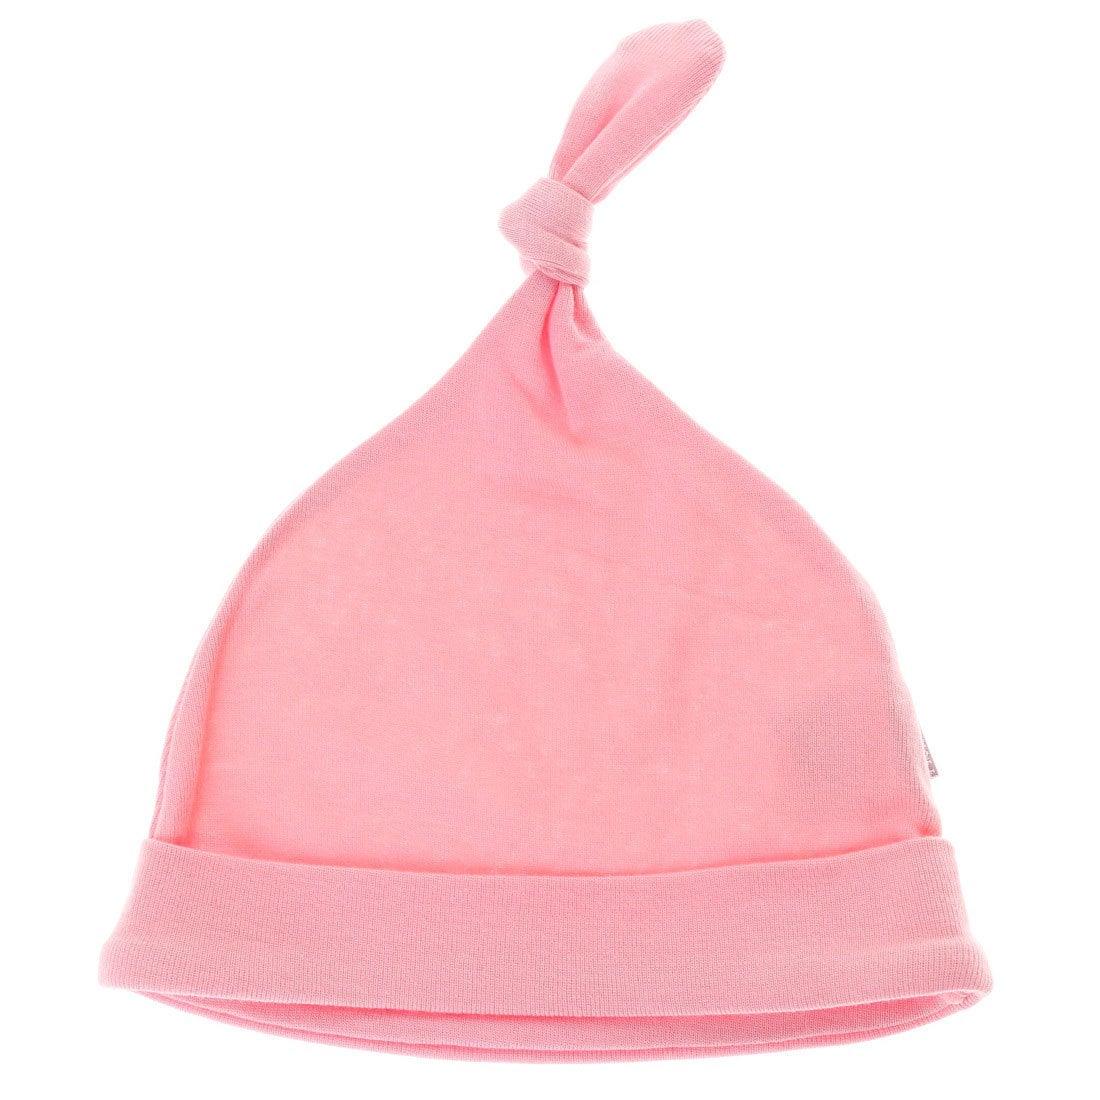 3a8c8126d70a2 リシェス richesse ベビーシンプル帽子 (ピンク) -アウトレット通販 ロコレット (LOCOLET)